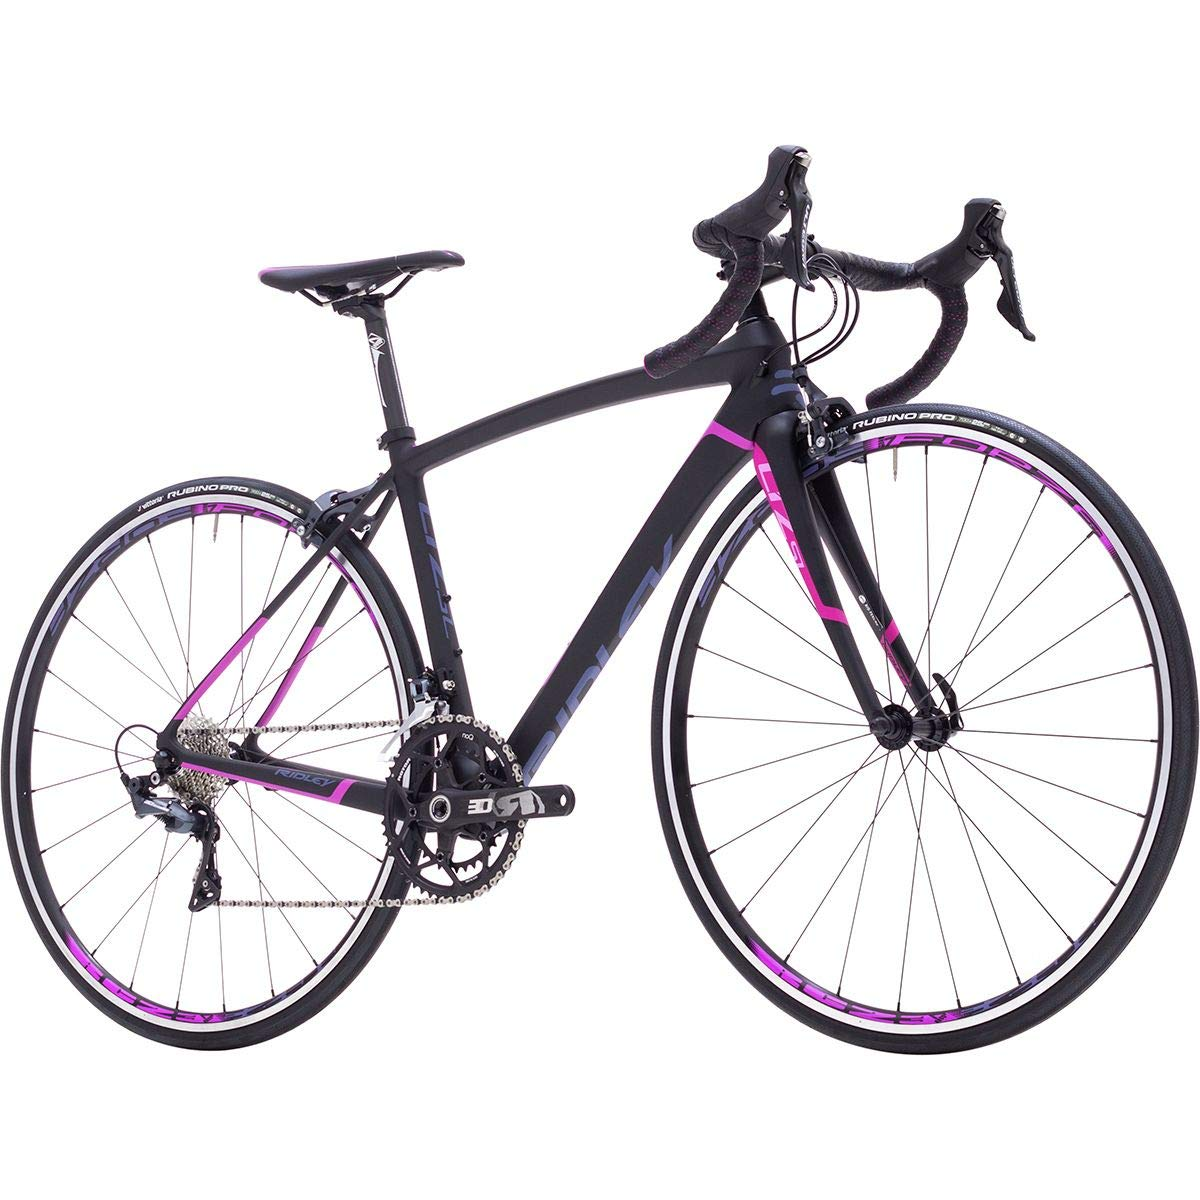 Ridley Liz SL Ultegra コンプリートロードバイク ブラック/パープル/グレー、S B07GXNFHSR